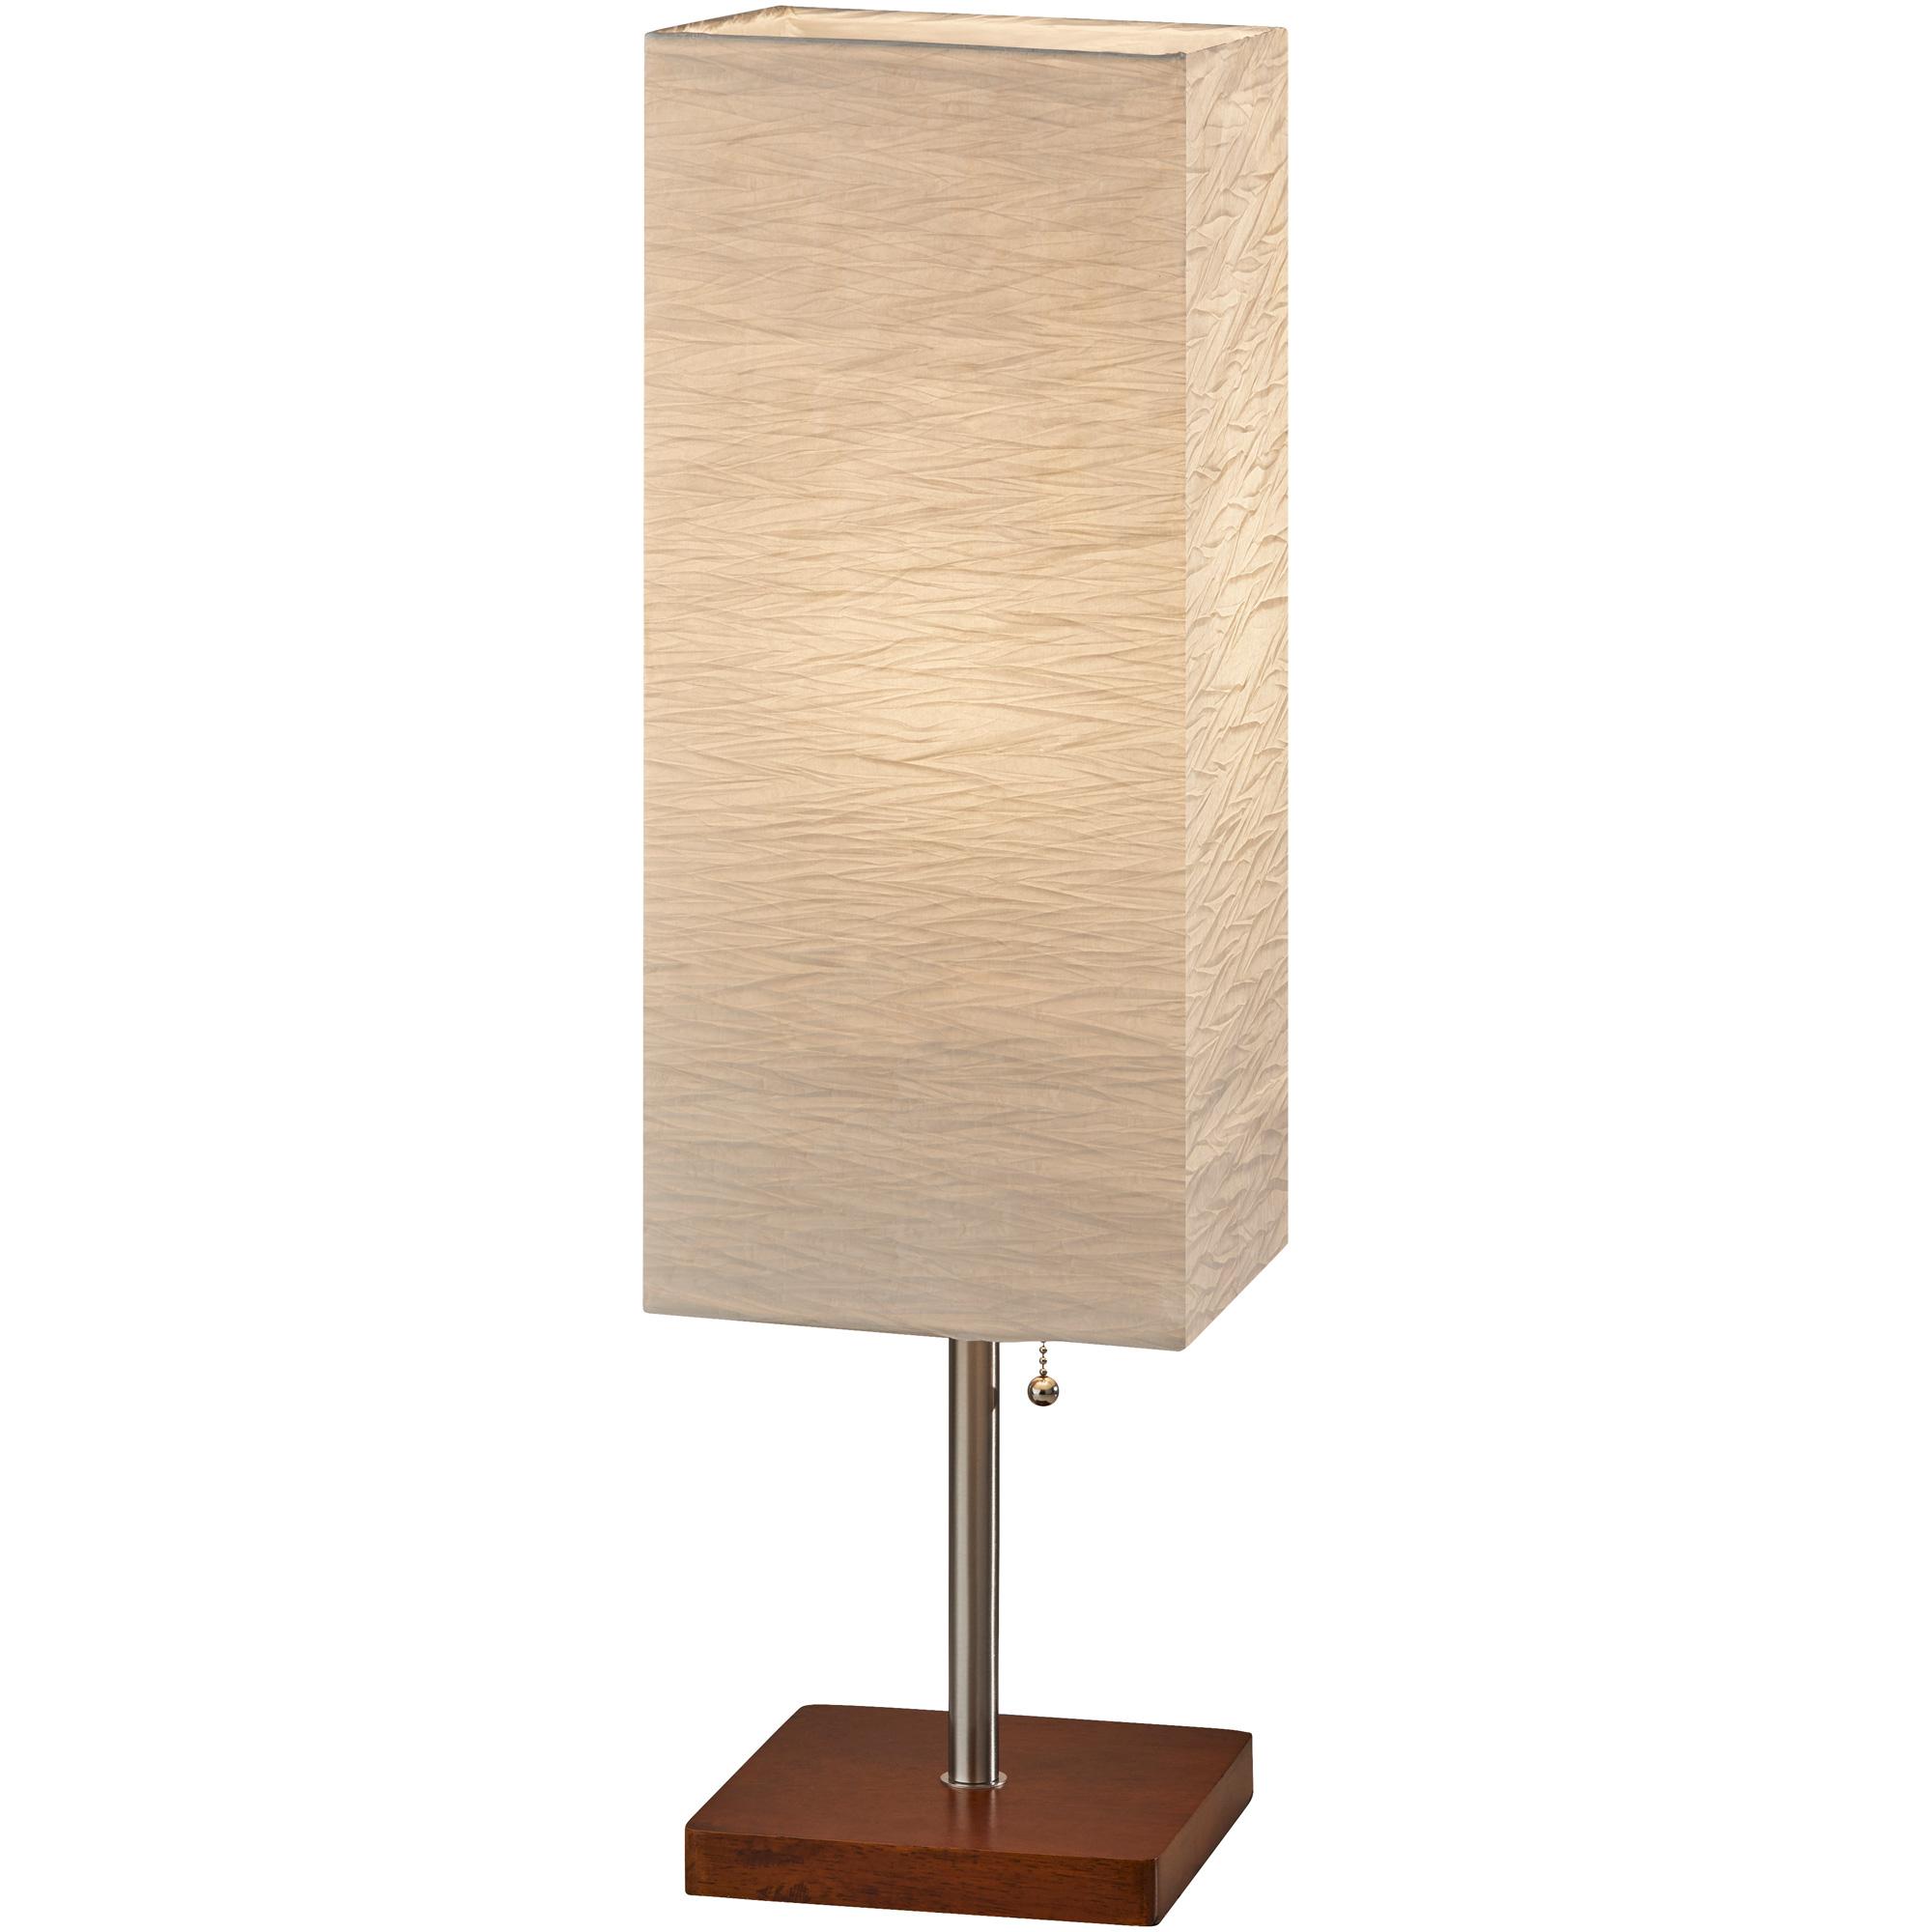 Adesso | Dune Walnut Table Lamp